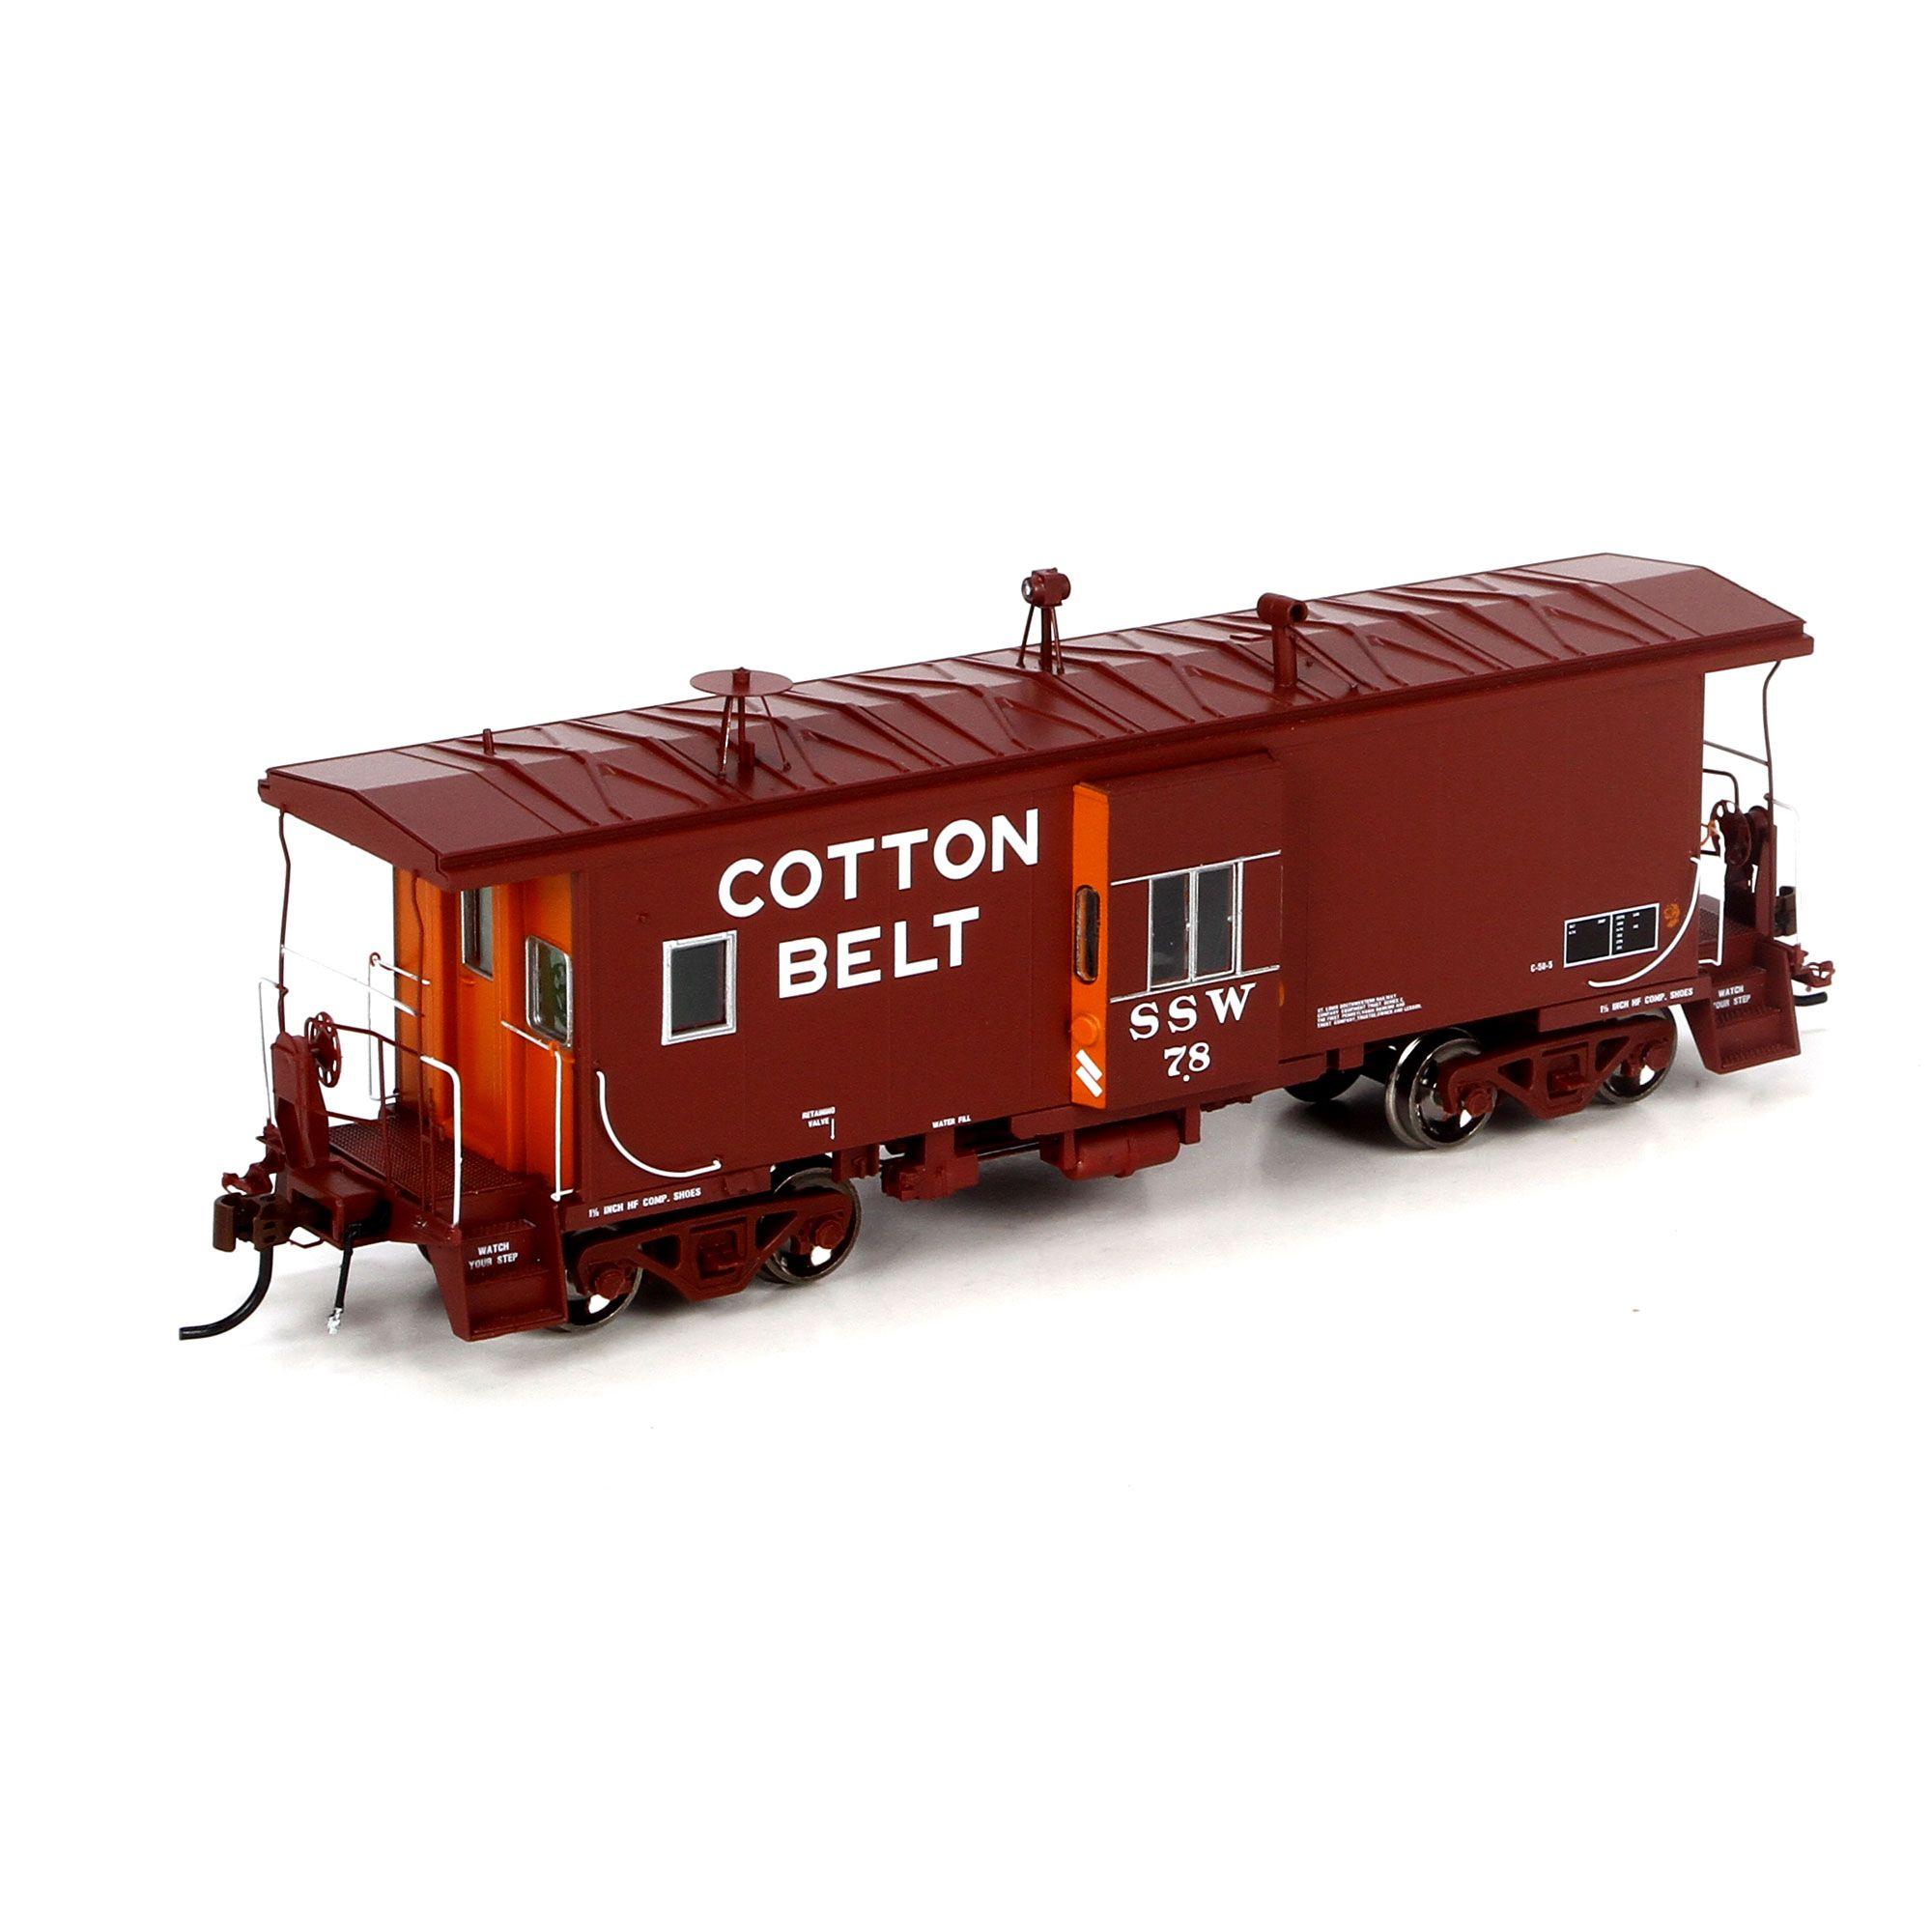 HO BW C-50-5 Caboose w/Lights, Cotton Belt #78 (ATHG63024): Athearn Trains